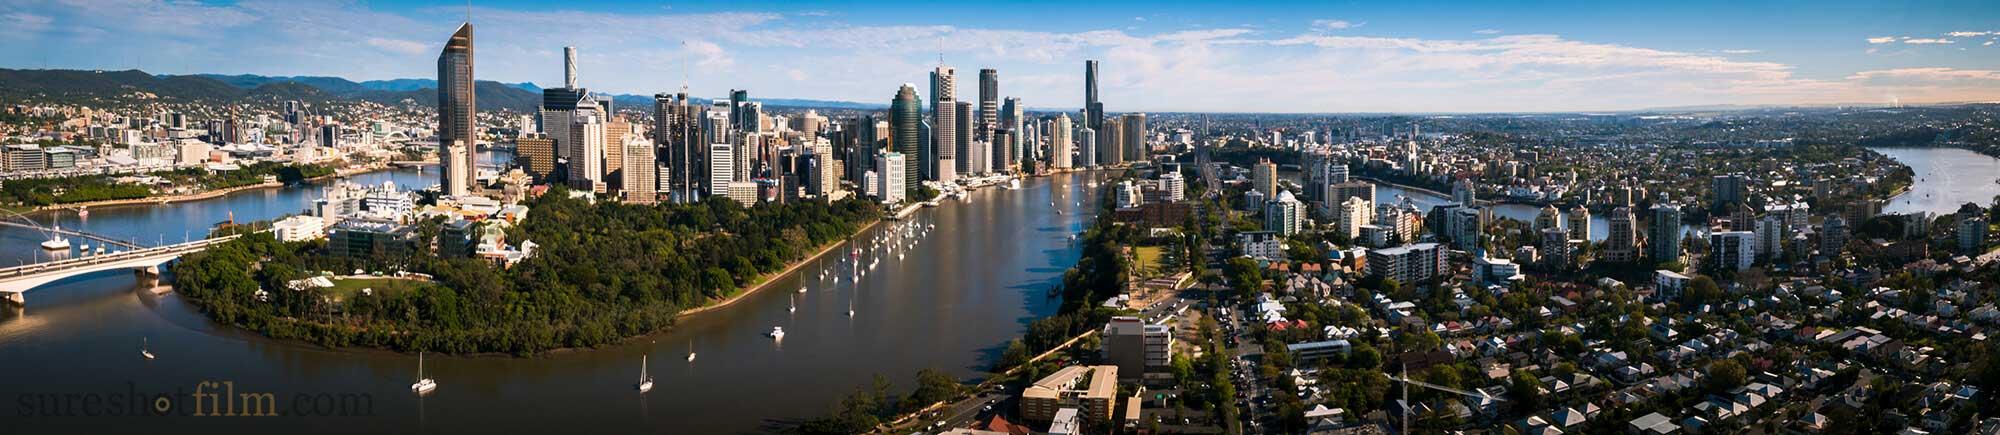 Drone Aerial Brisbane River Real Estate Promotion 2000